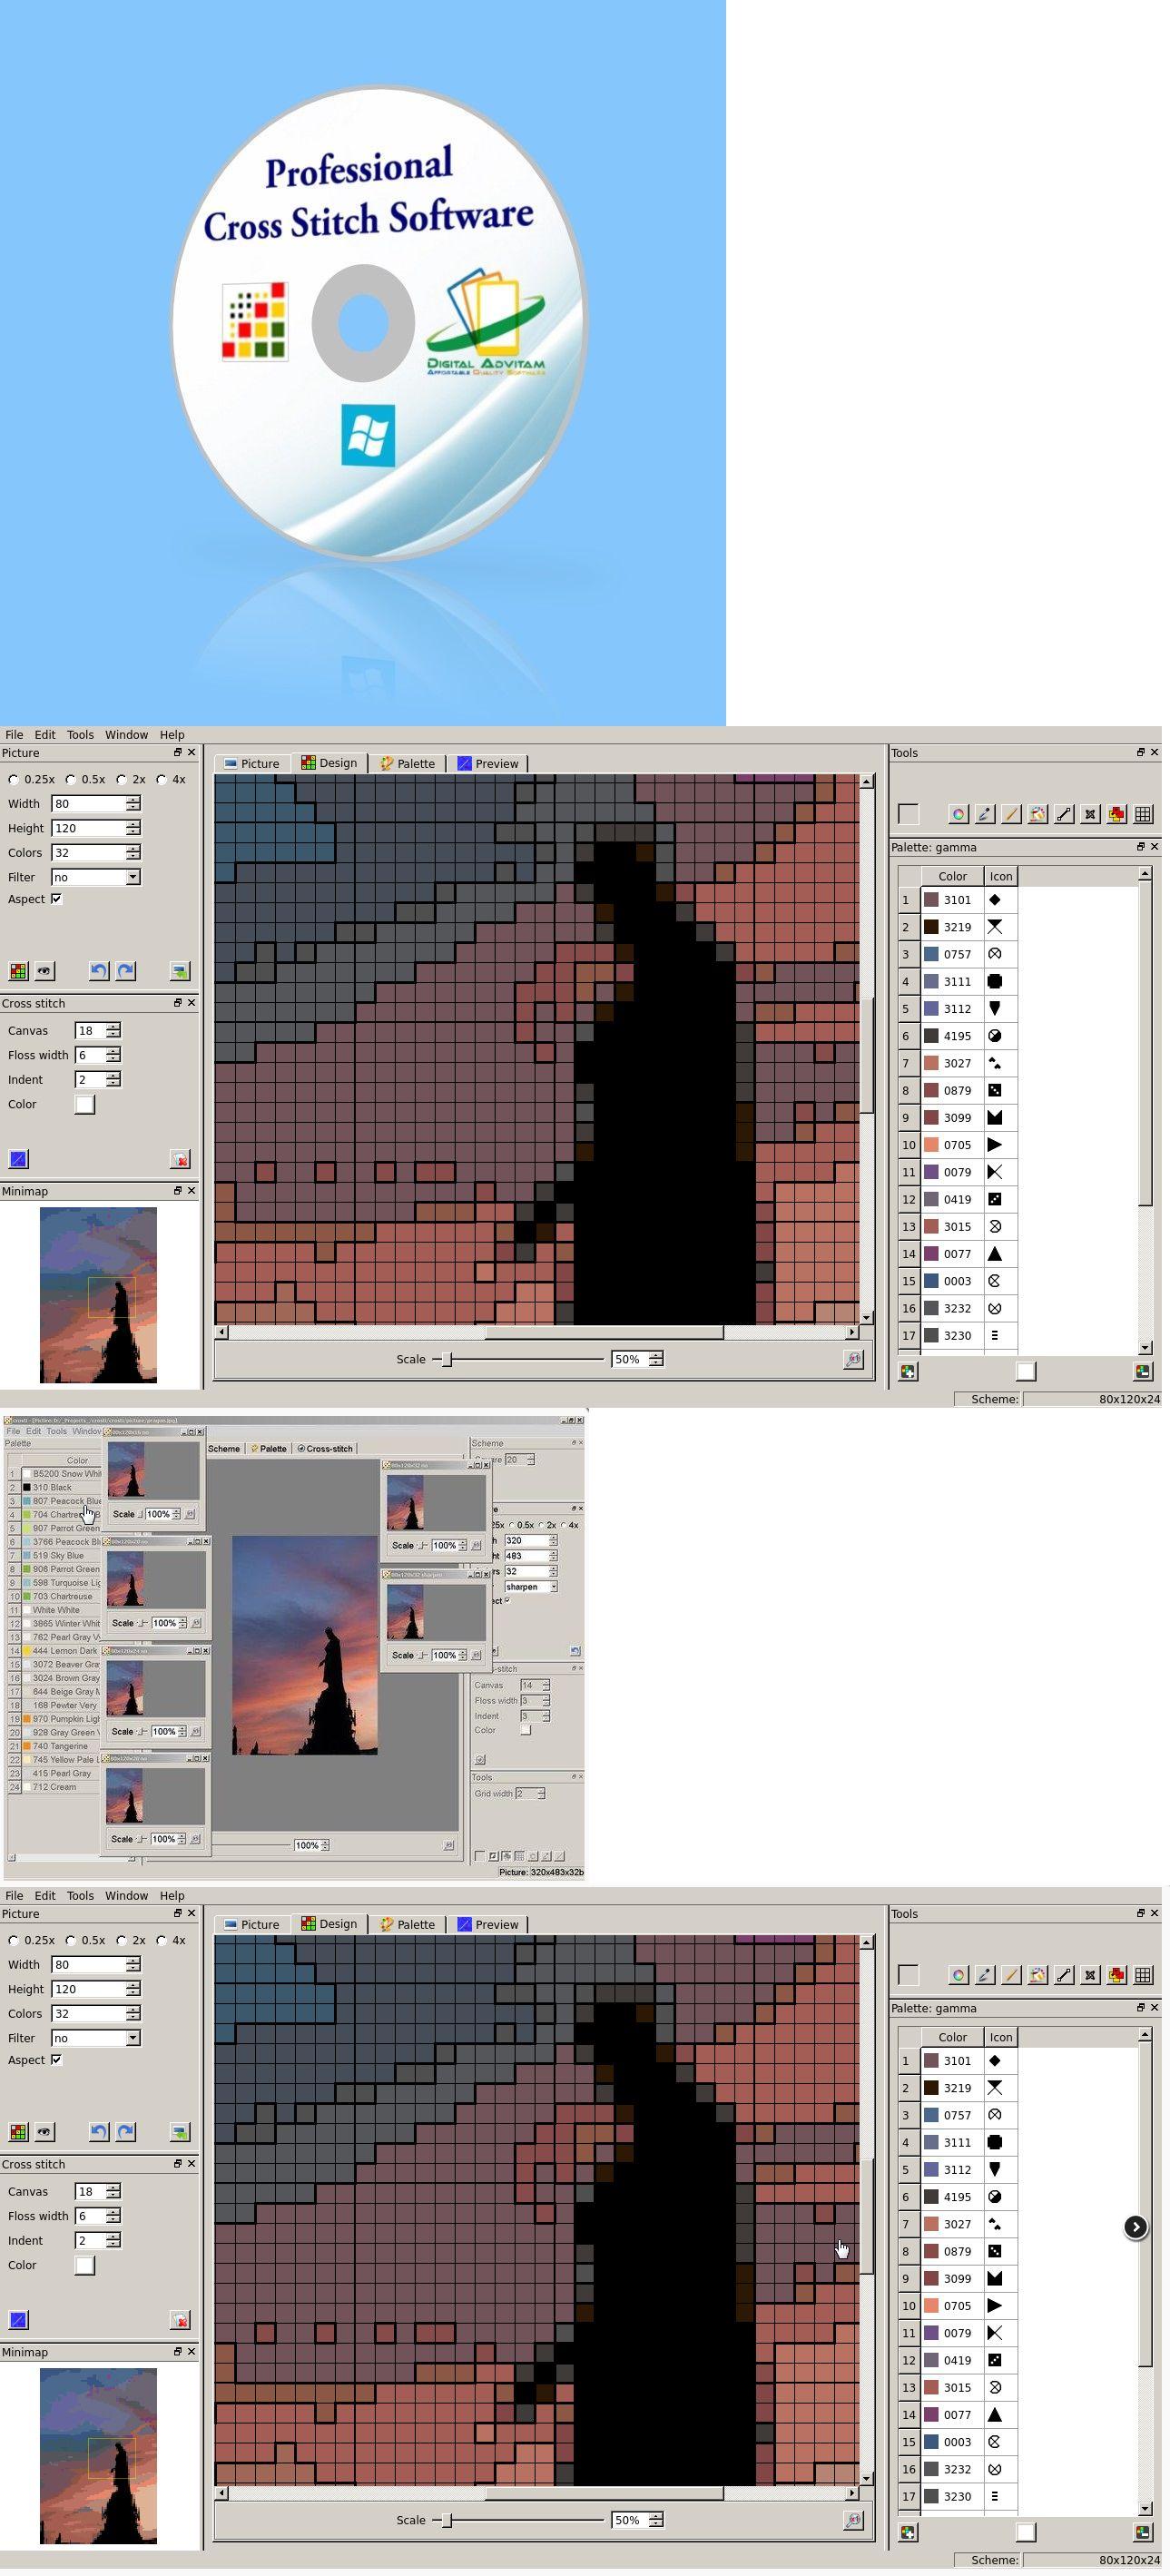 Hobbies And Leisure 80015 Cross Stitch Software Design Program